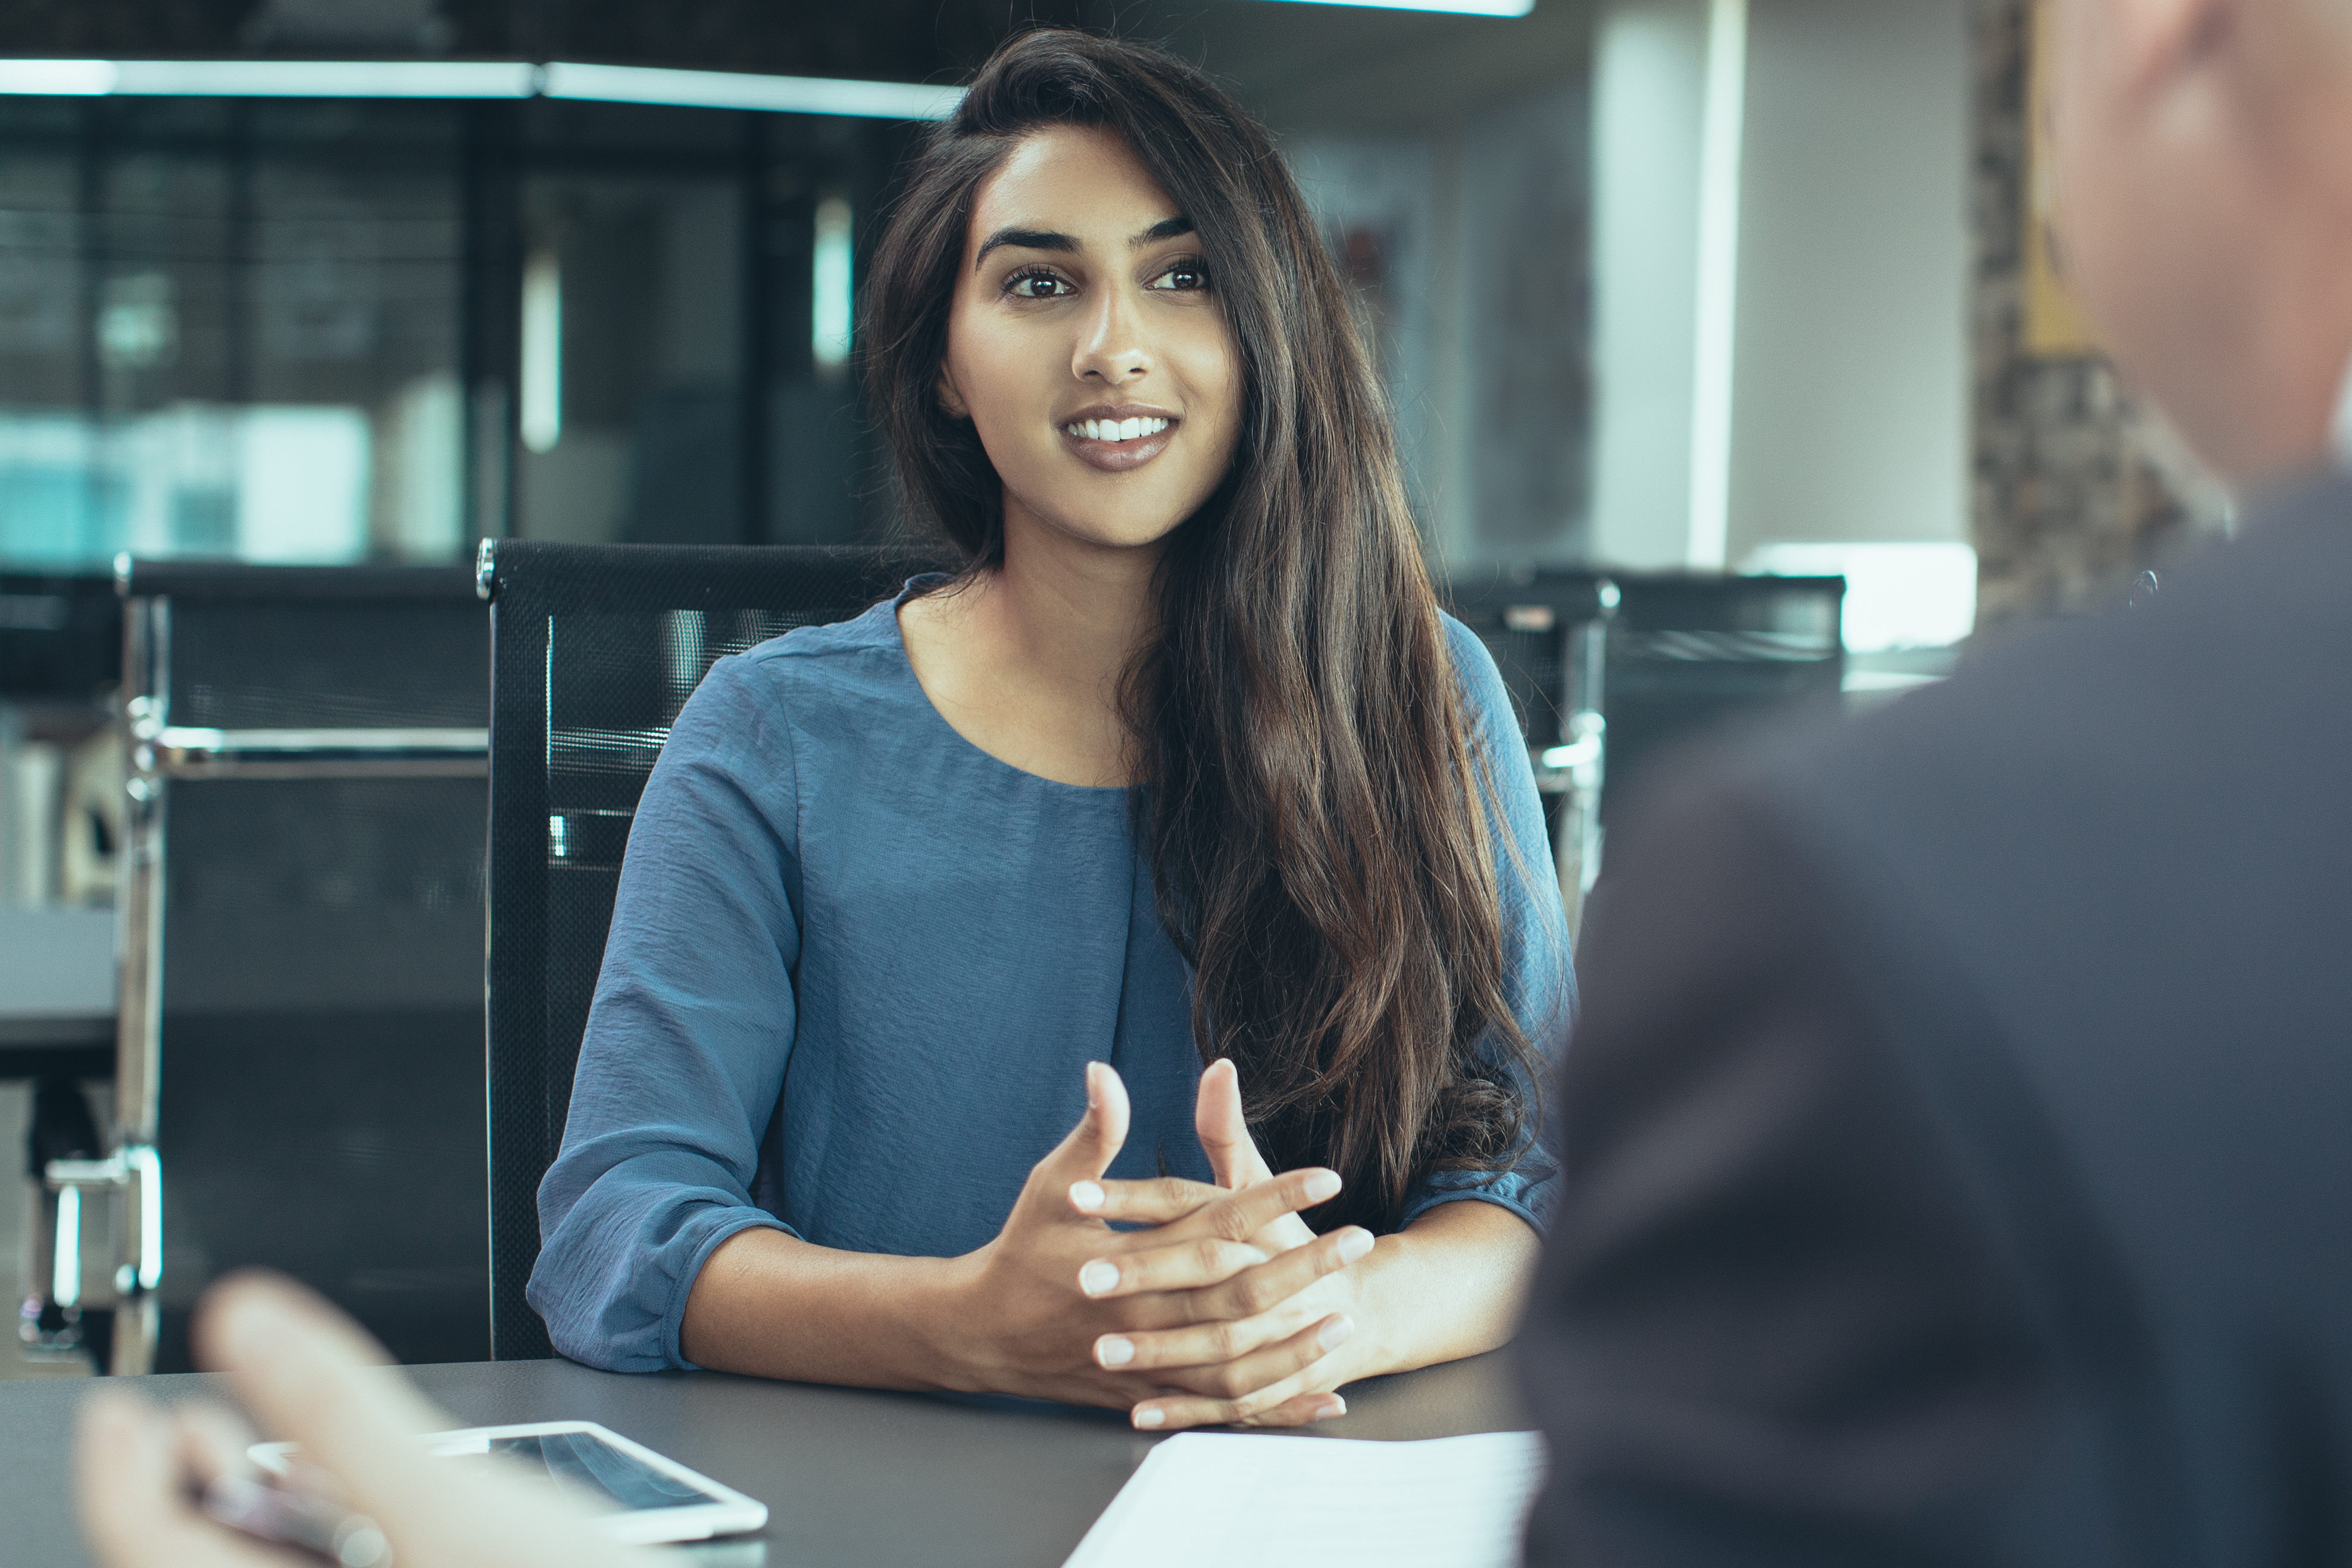 Awkward Job Interviews Facts